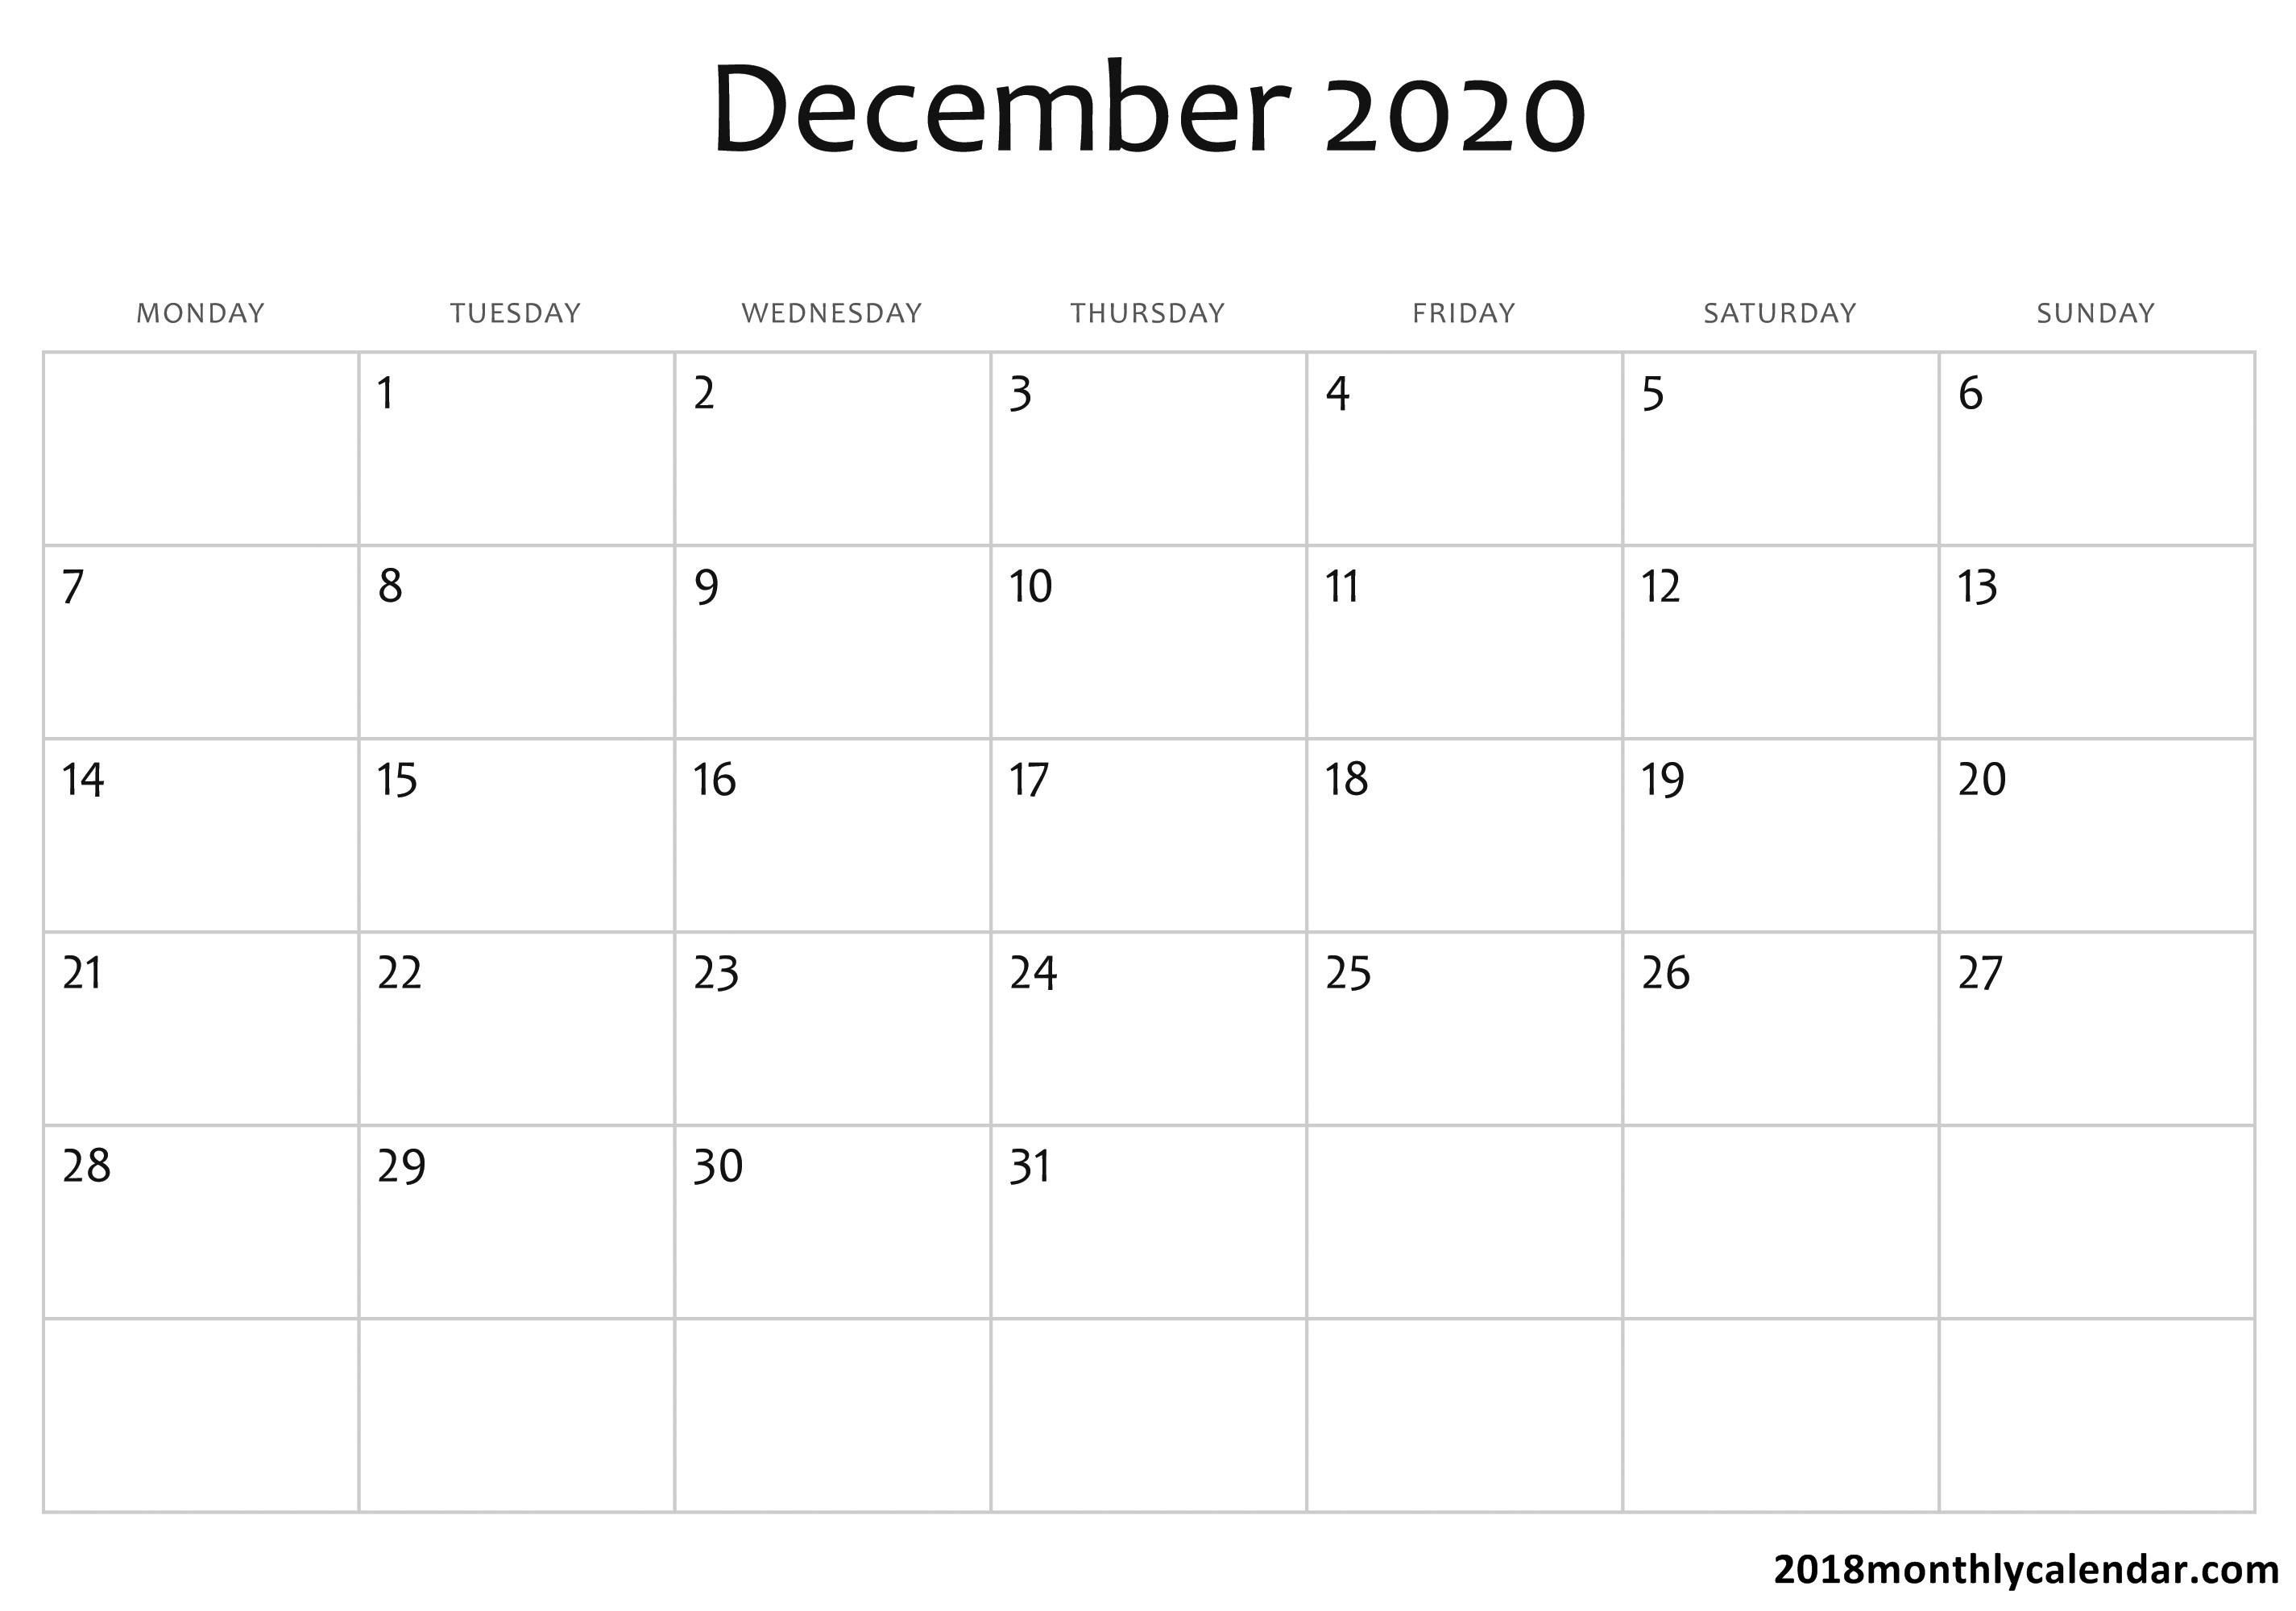 Download December 2020 Calendar – Blank & Editable